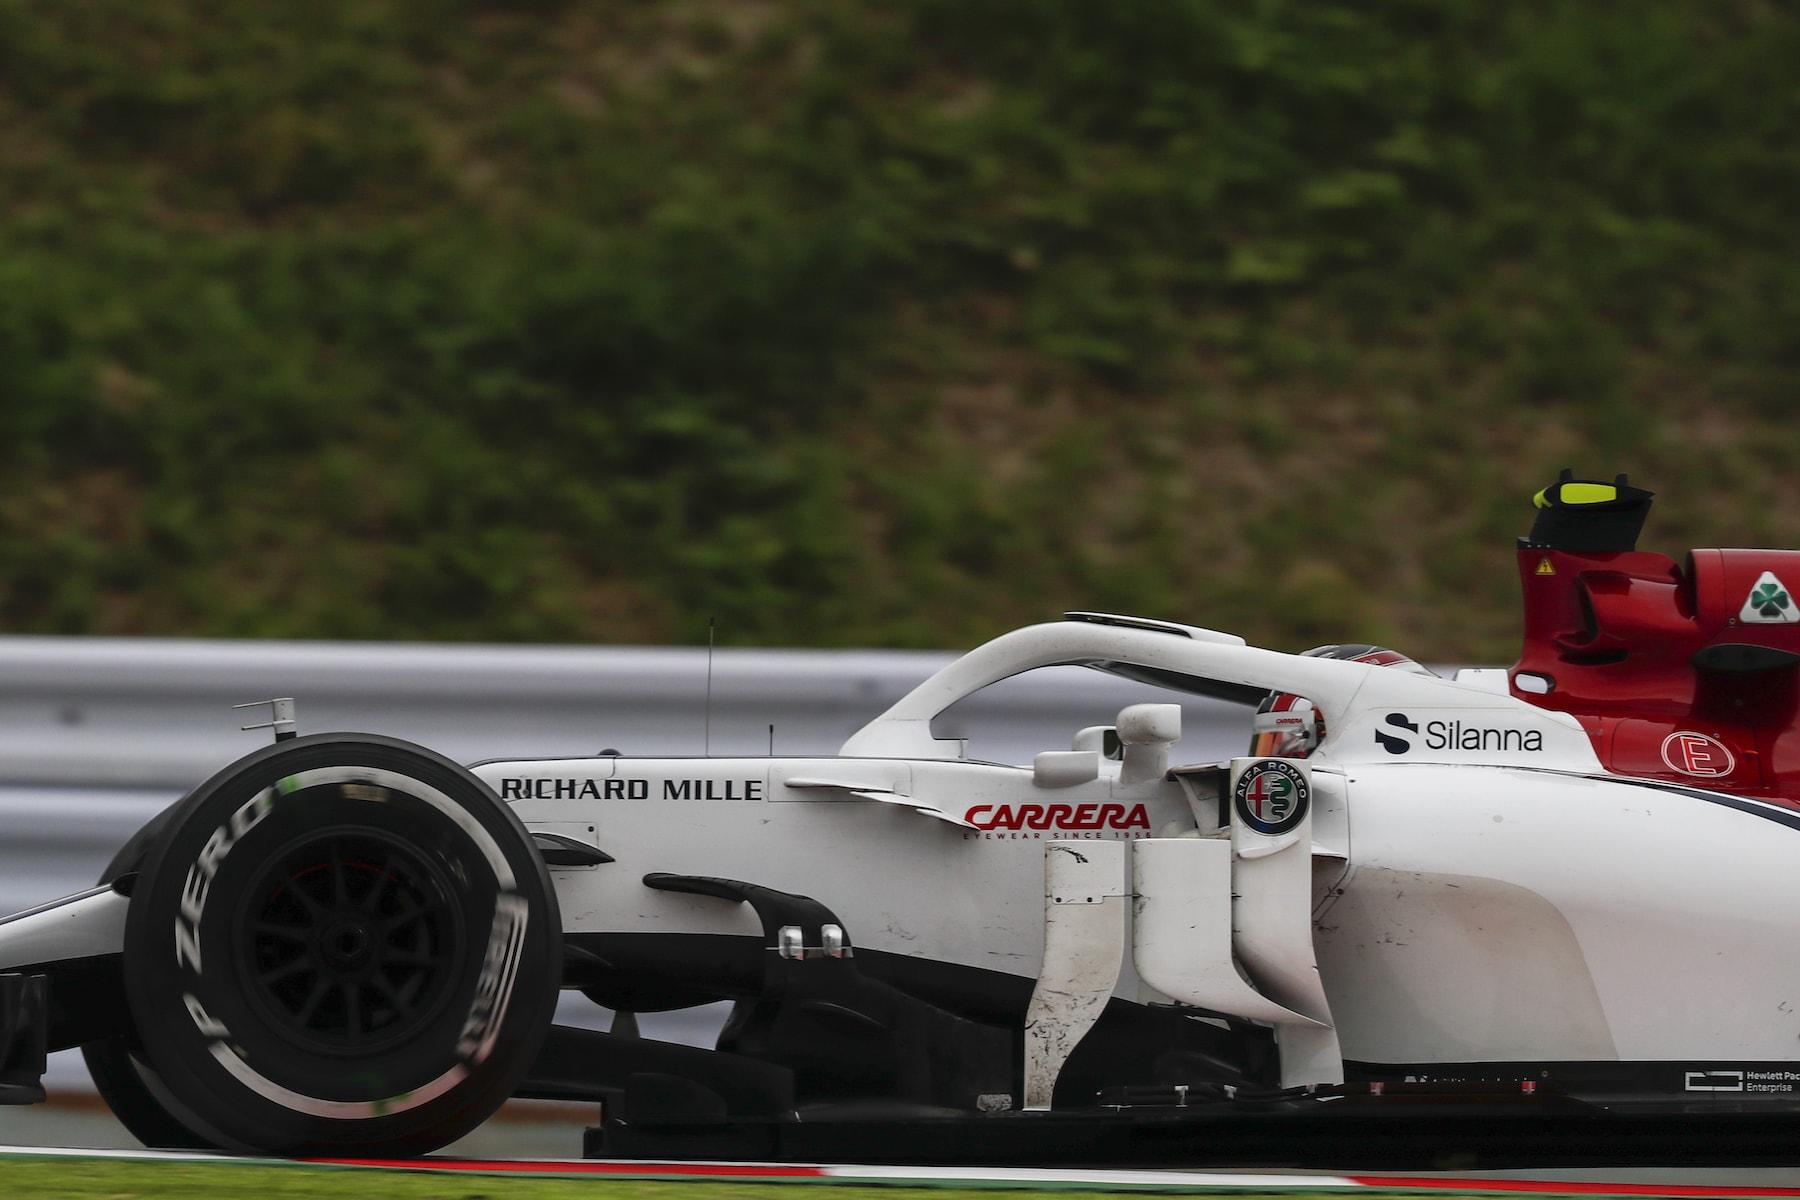 2018 Charles Leclerc | Sauber C37 | 2018 Japanese GP 4 copy.jpg